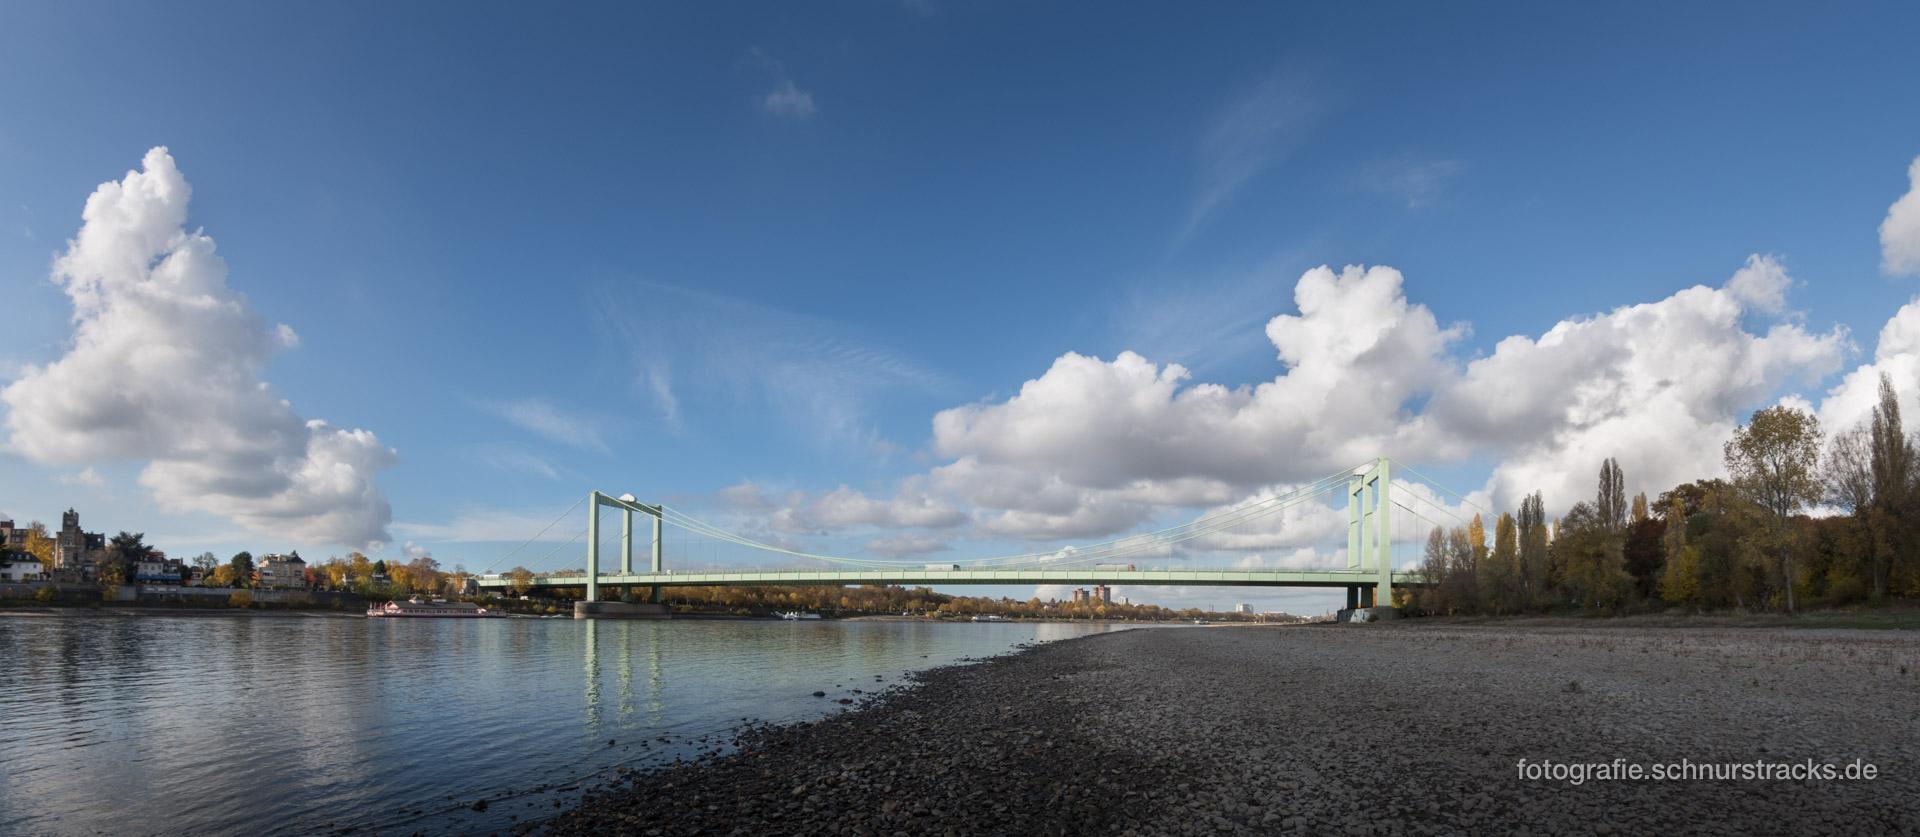 Rodenkirchener Brücke #6303